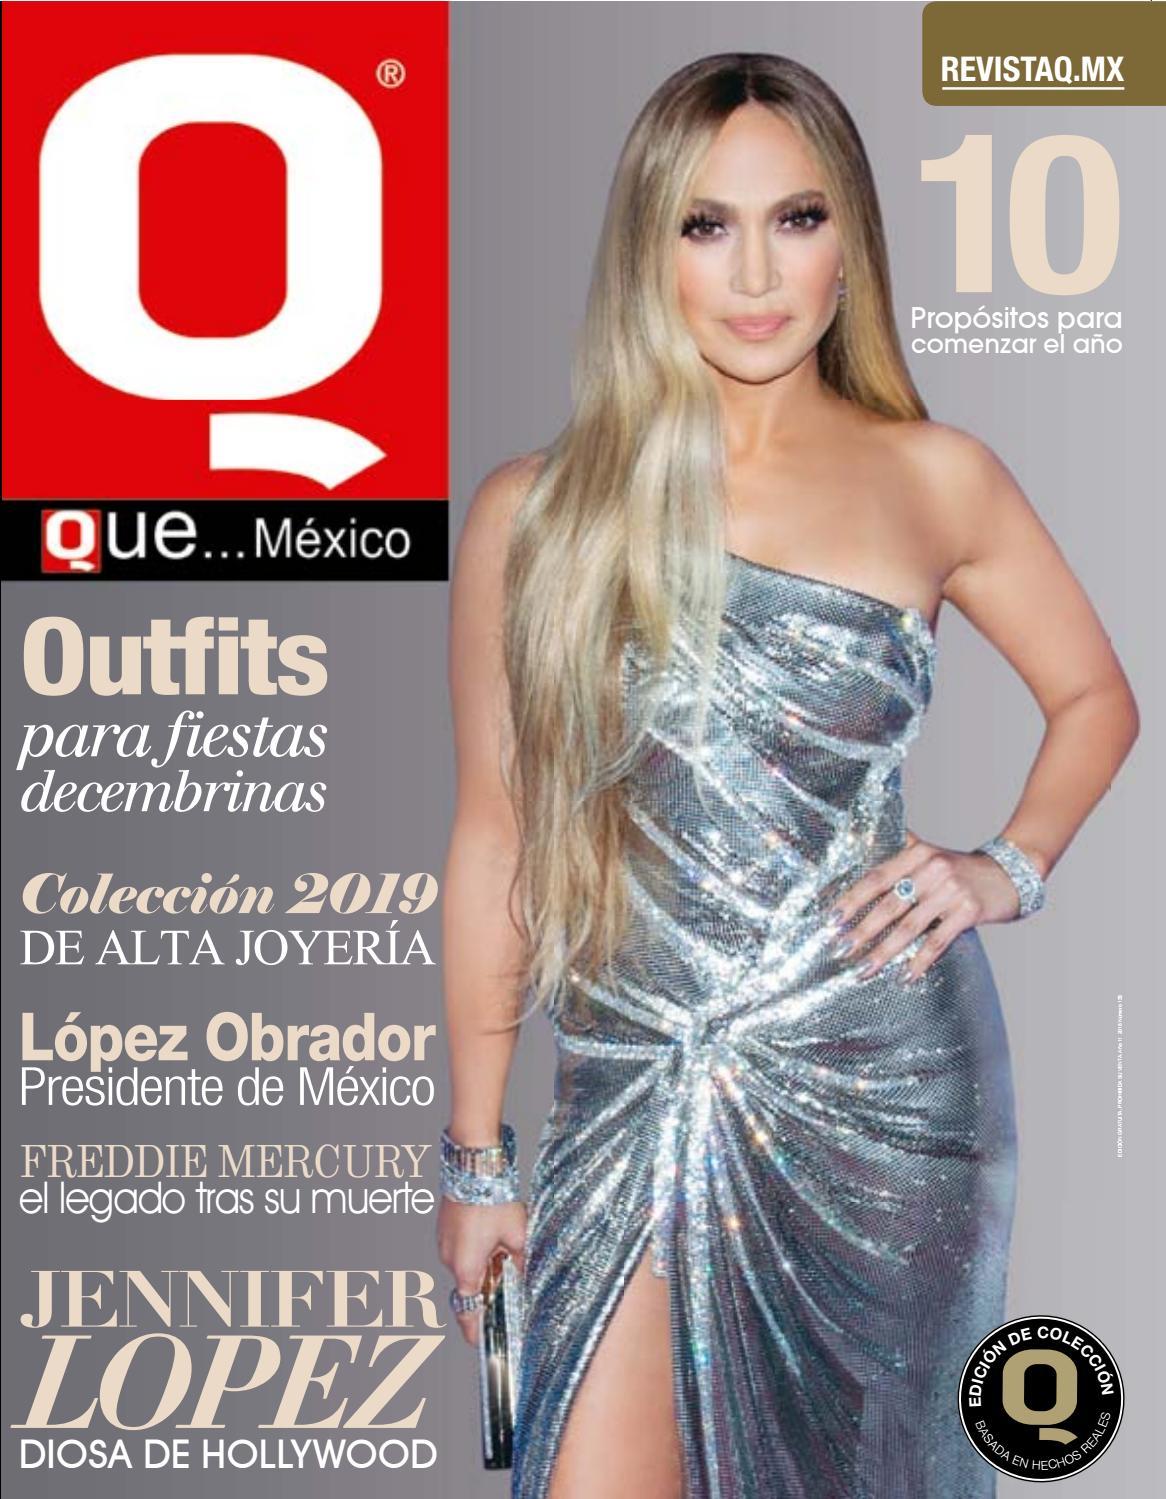 Revista Q Qué México Ed. 60 by Revista Q Que México